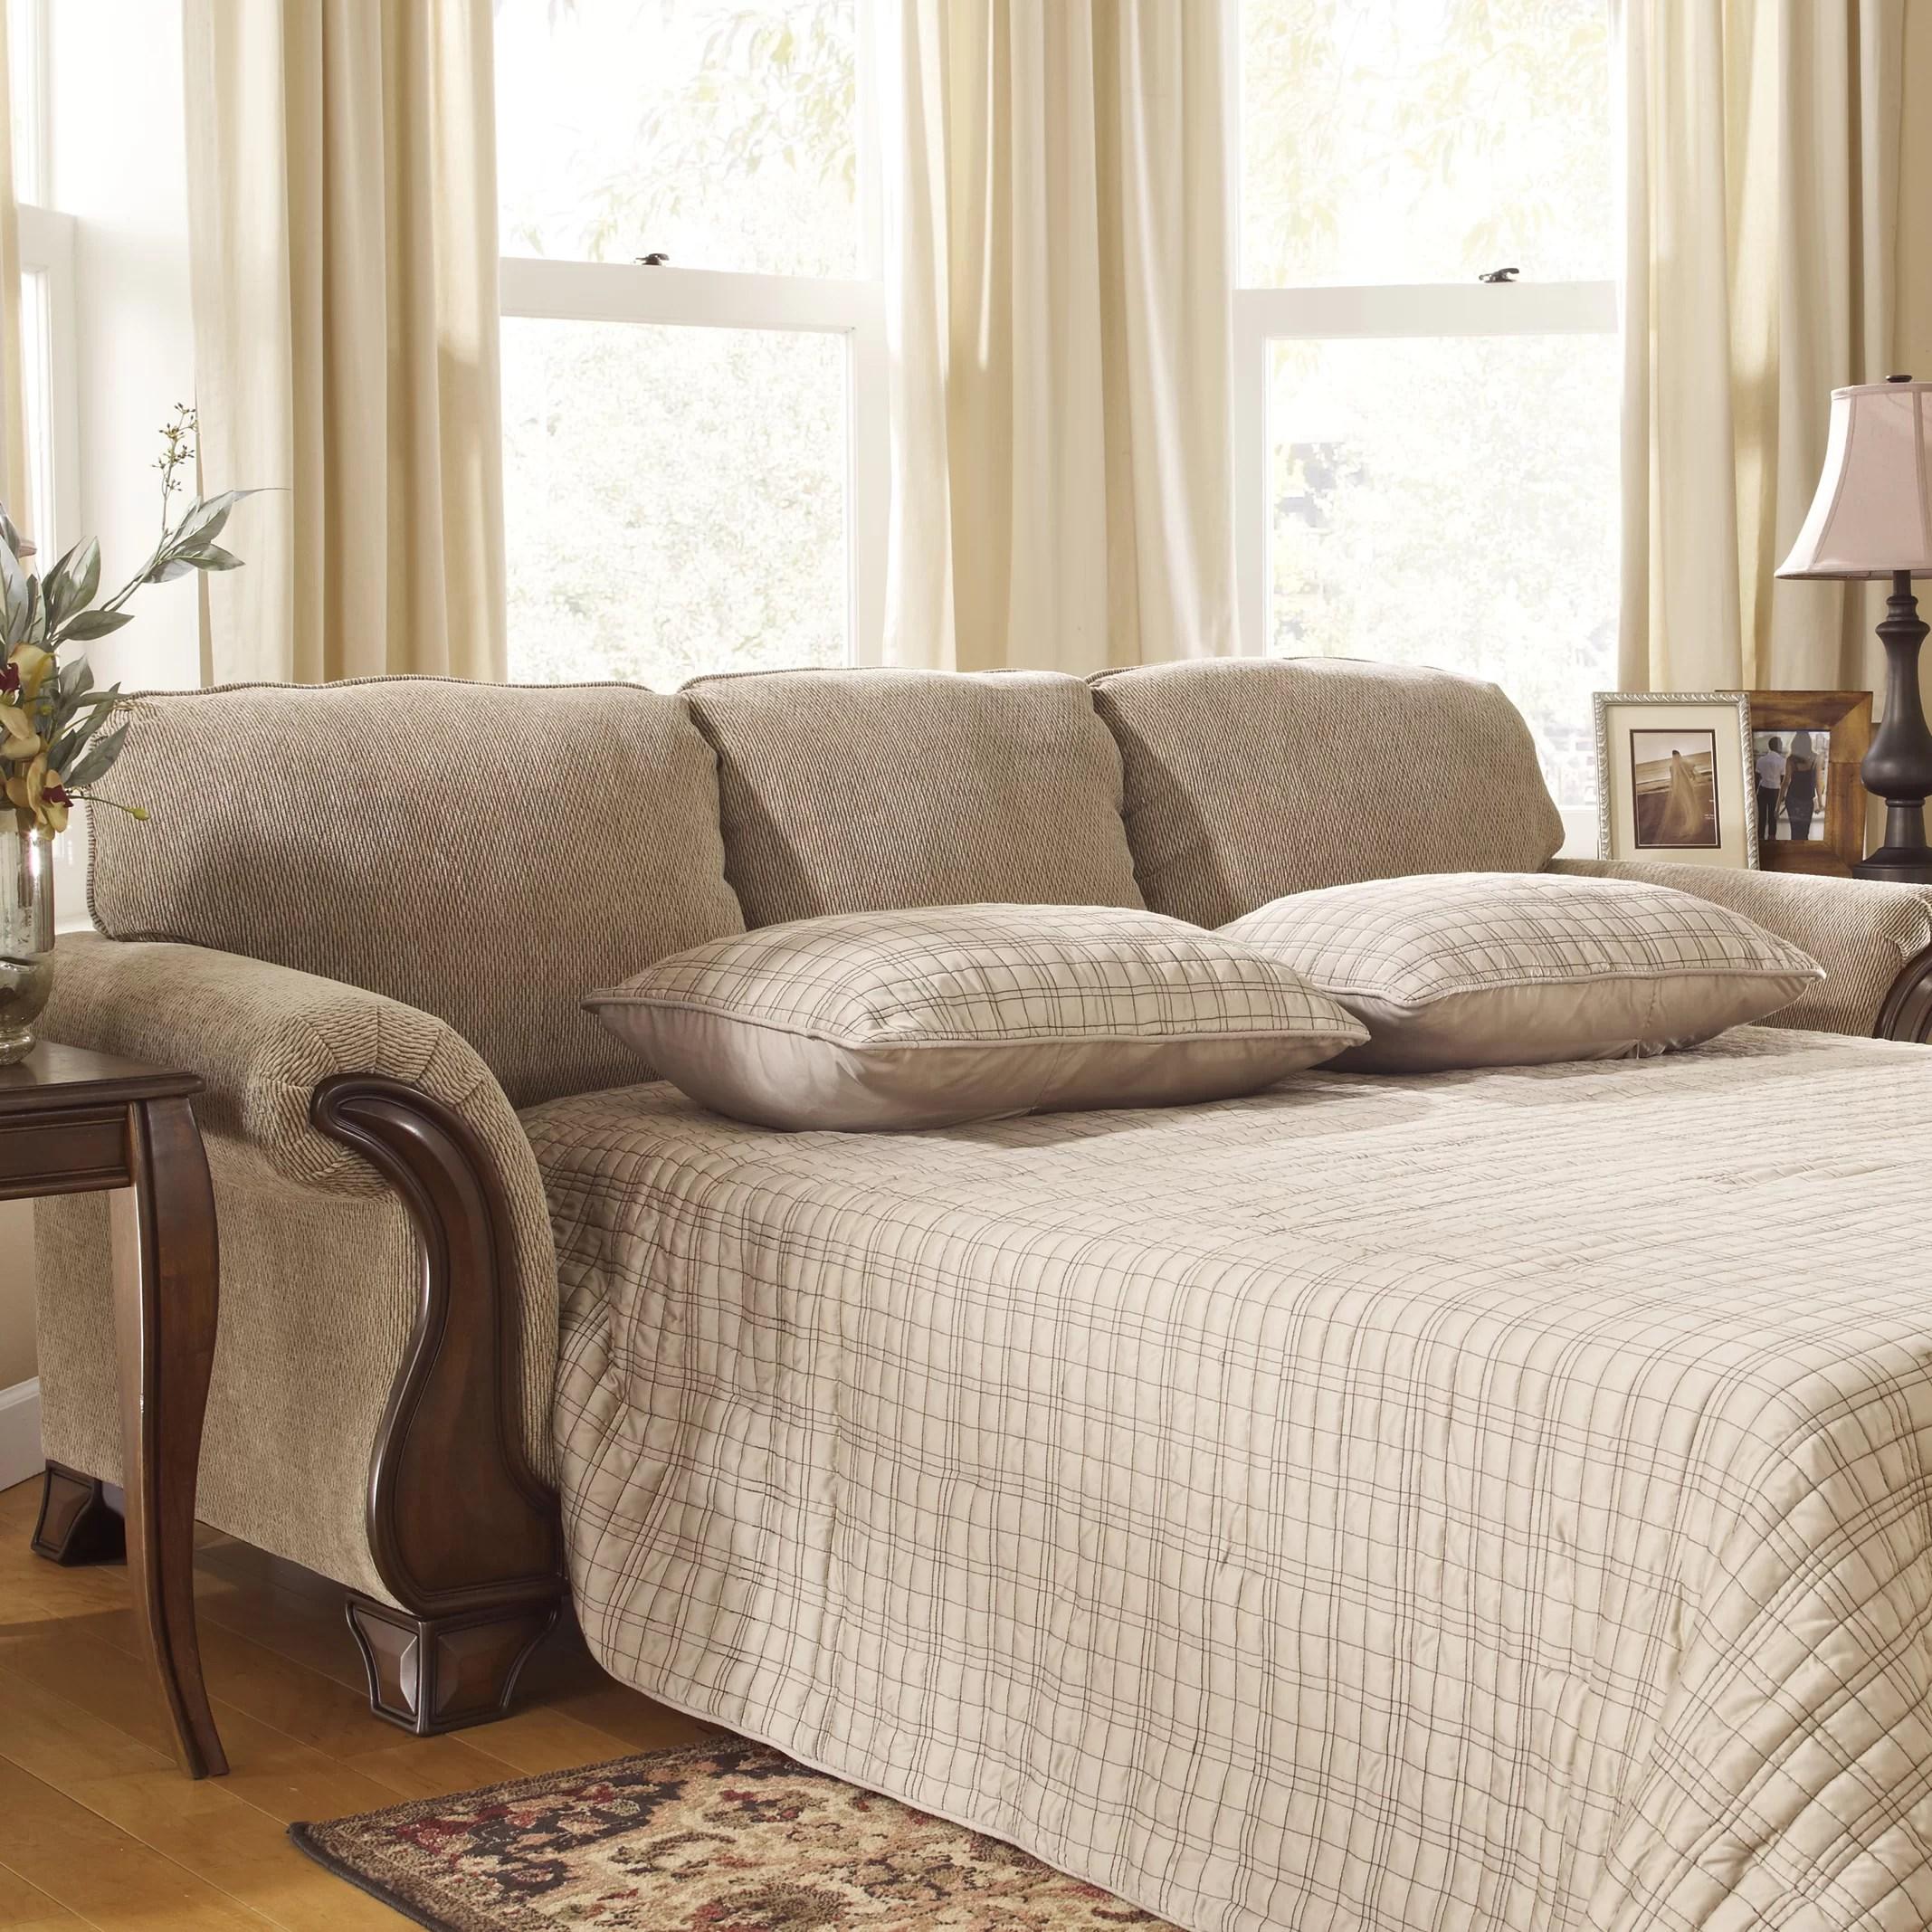 signature design by ashley harvest sleeper sofa henredon sofas lanett living room collection wayfair